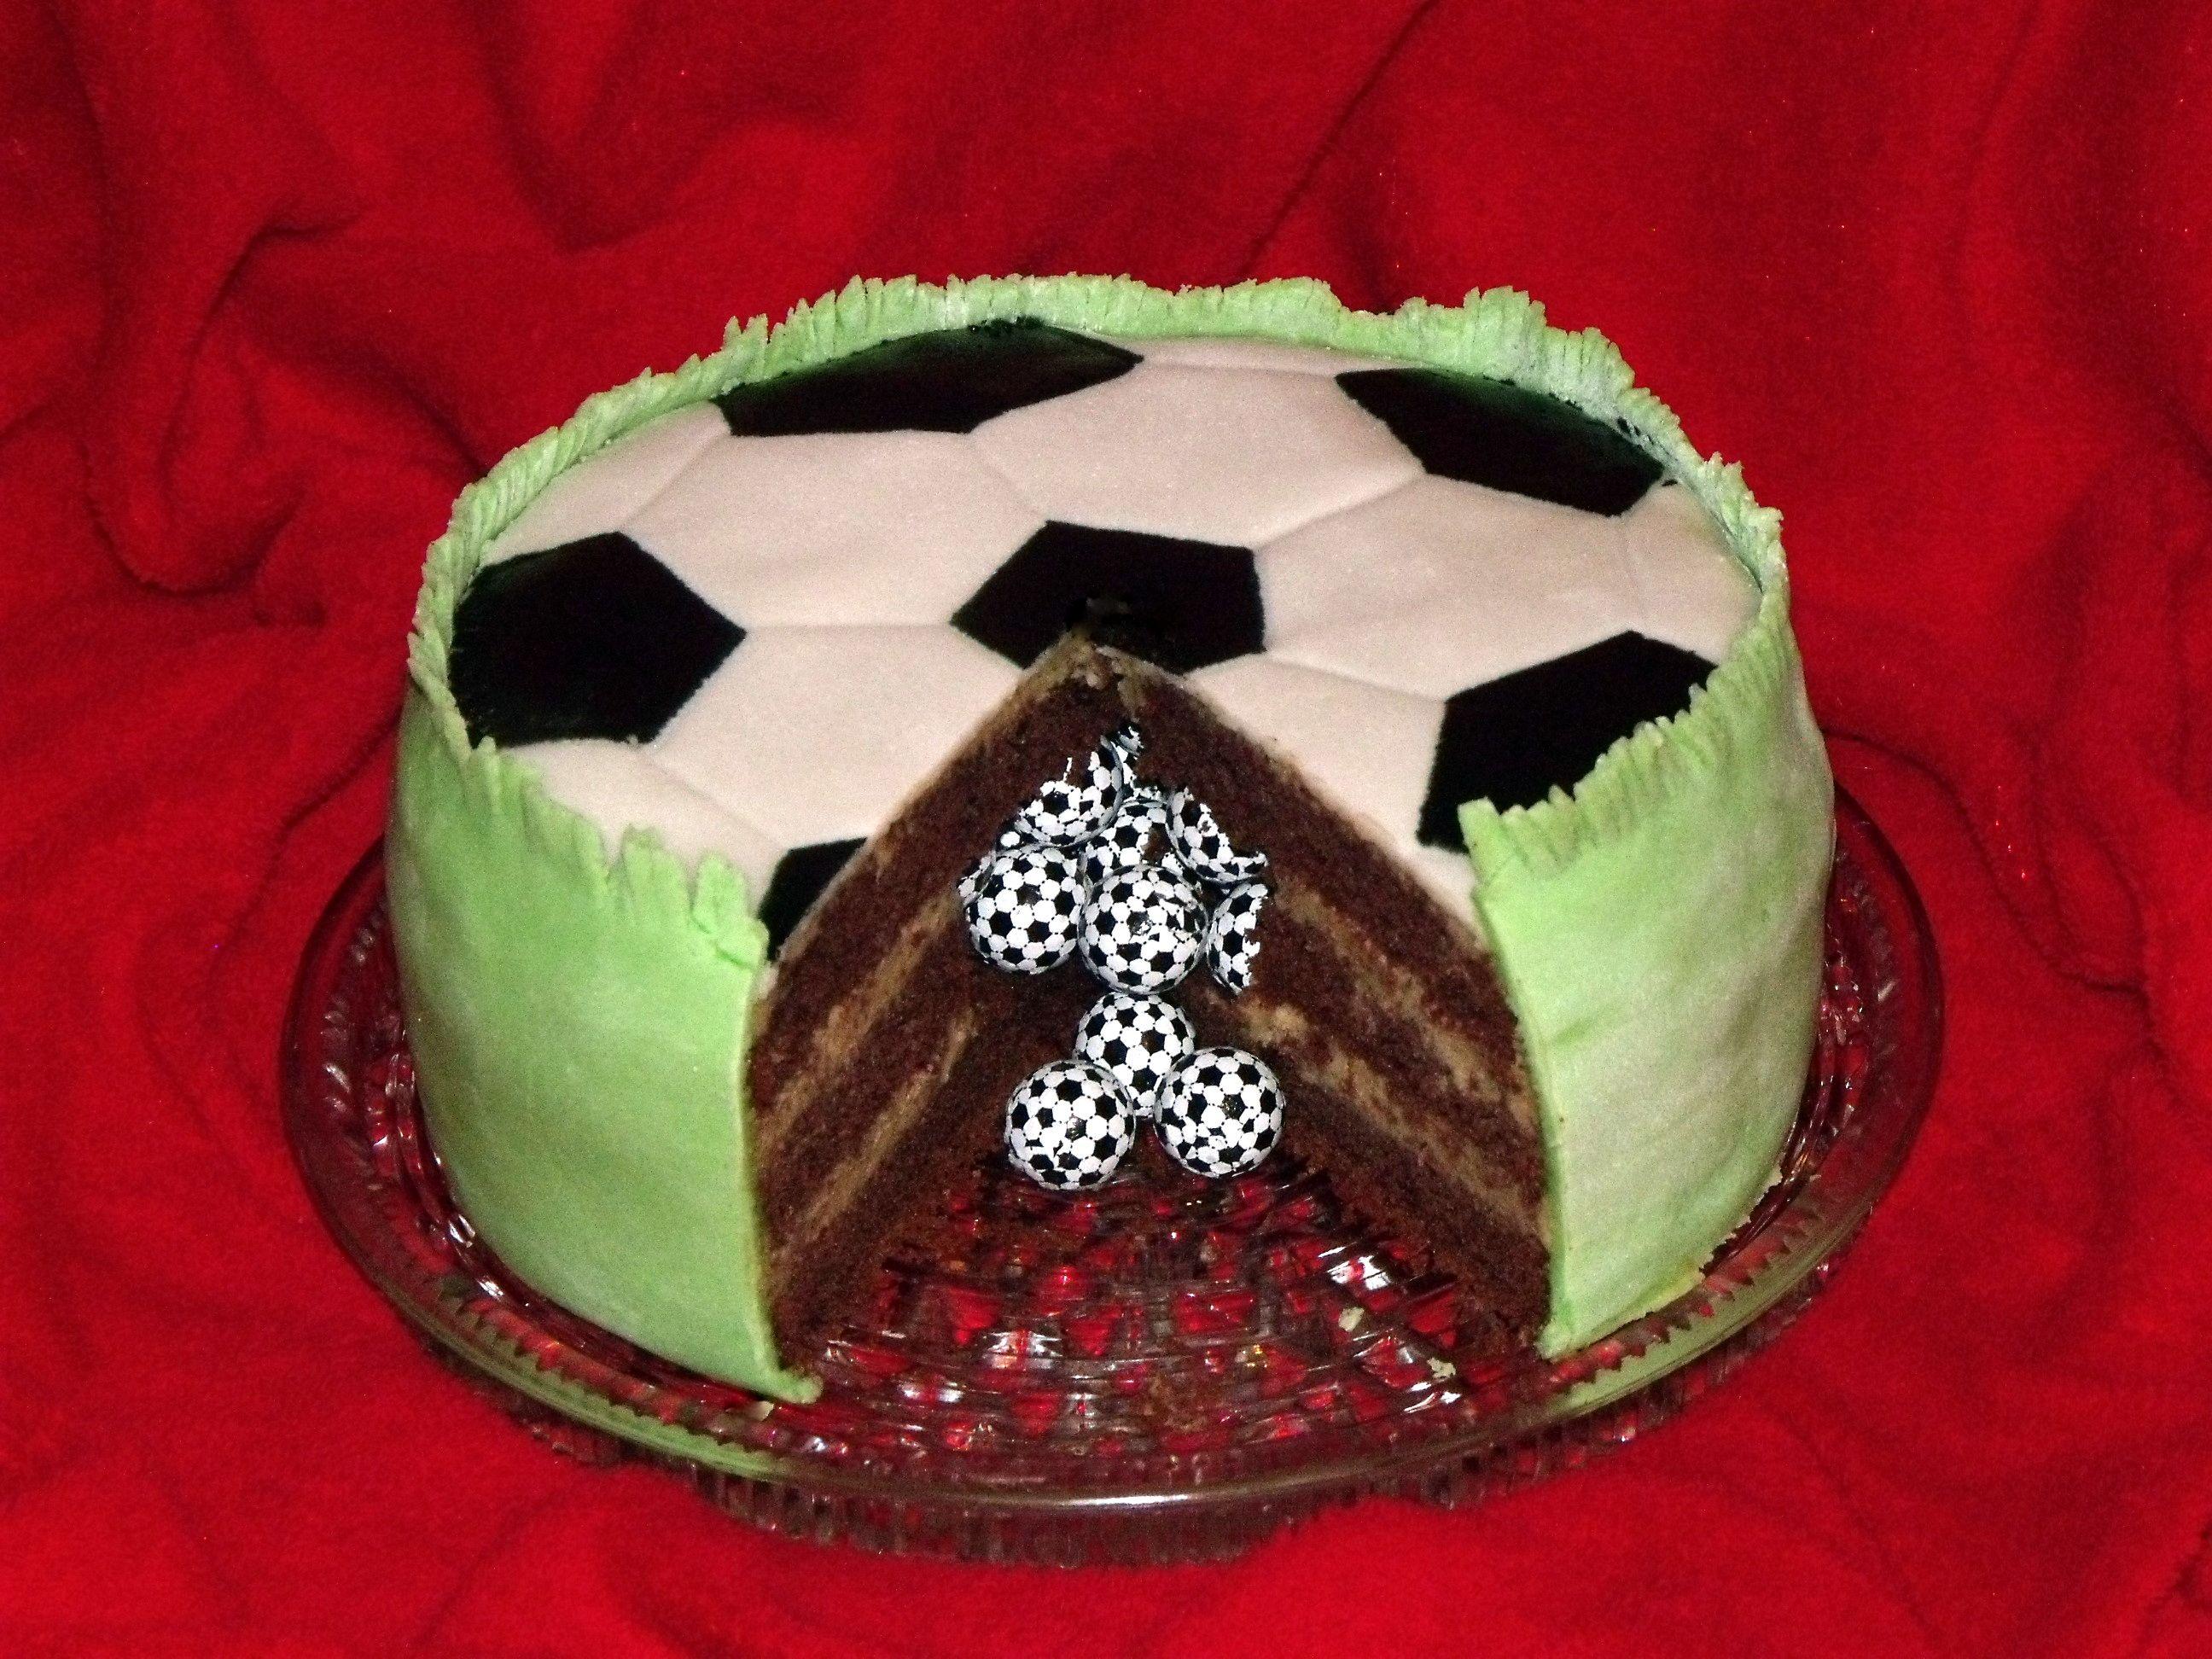 focis torta képek Focis / pinata torta | Tortáim | Pinterest focis torta képek